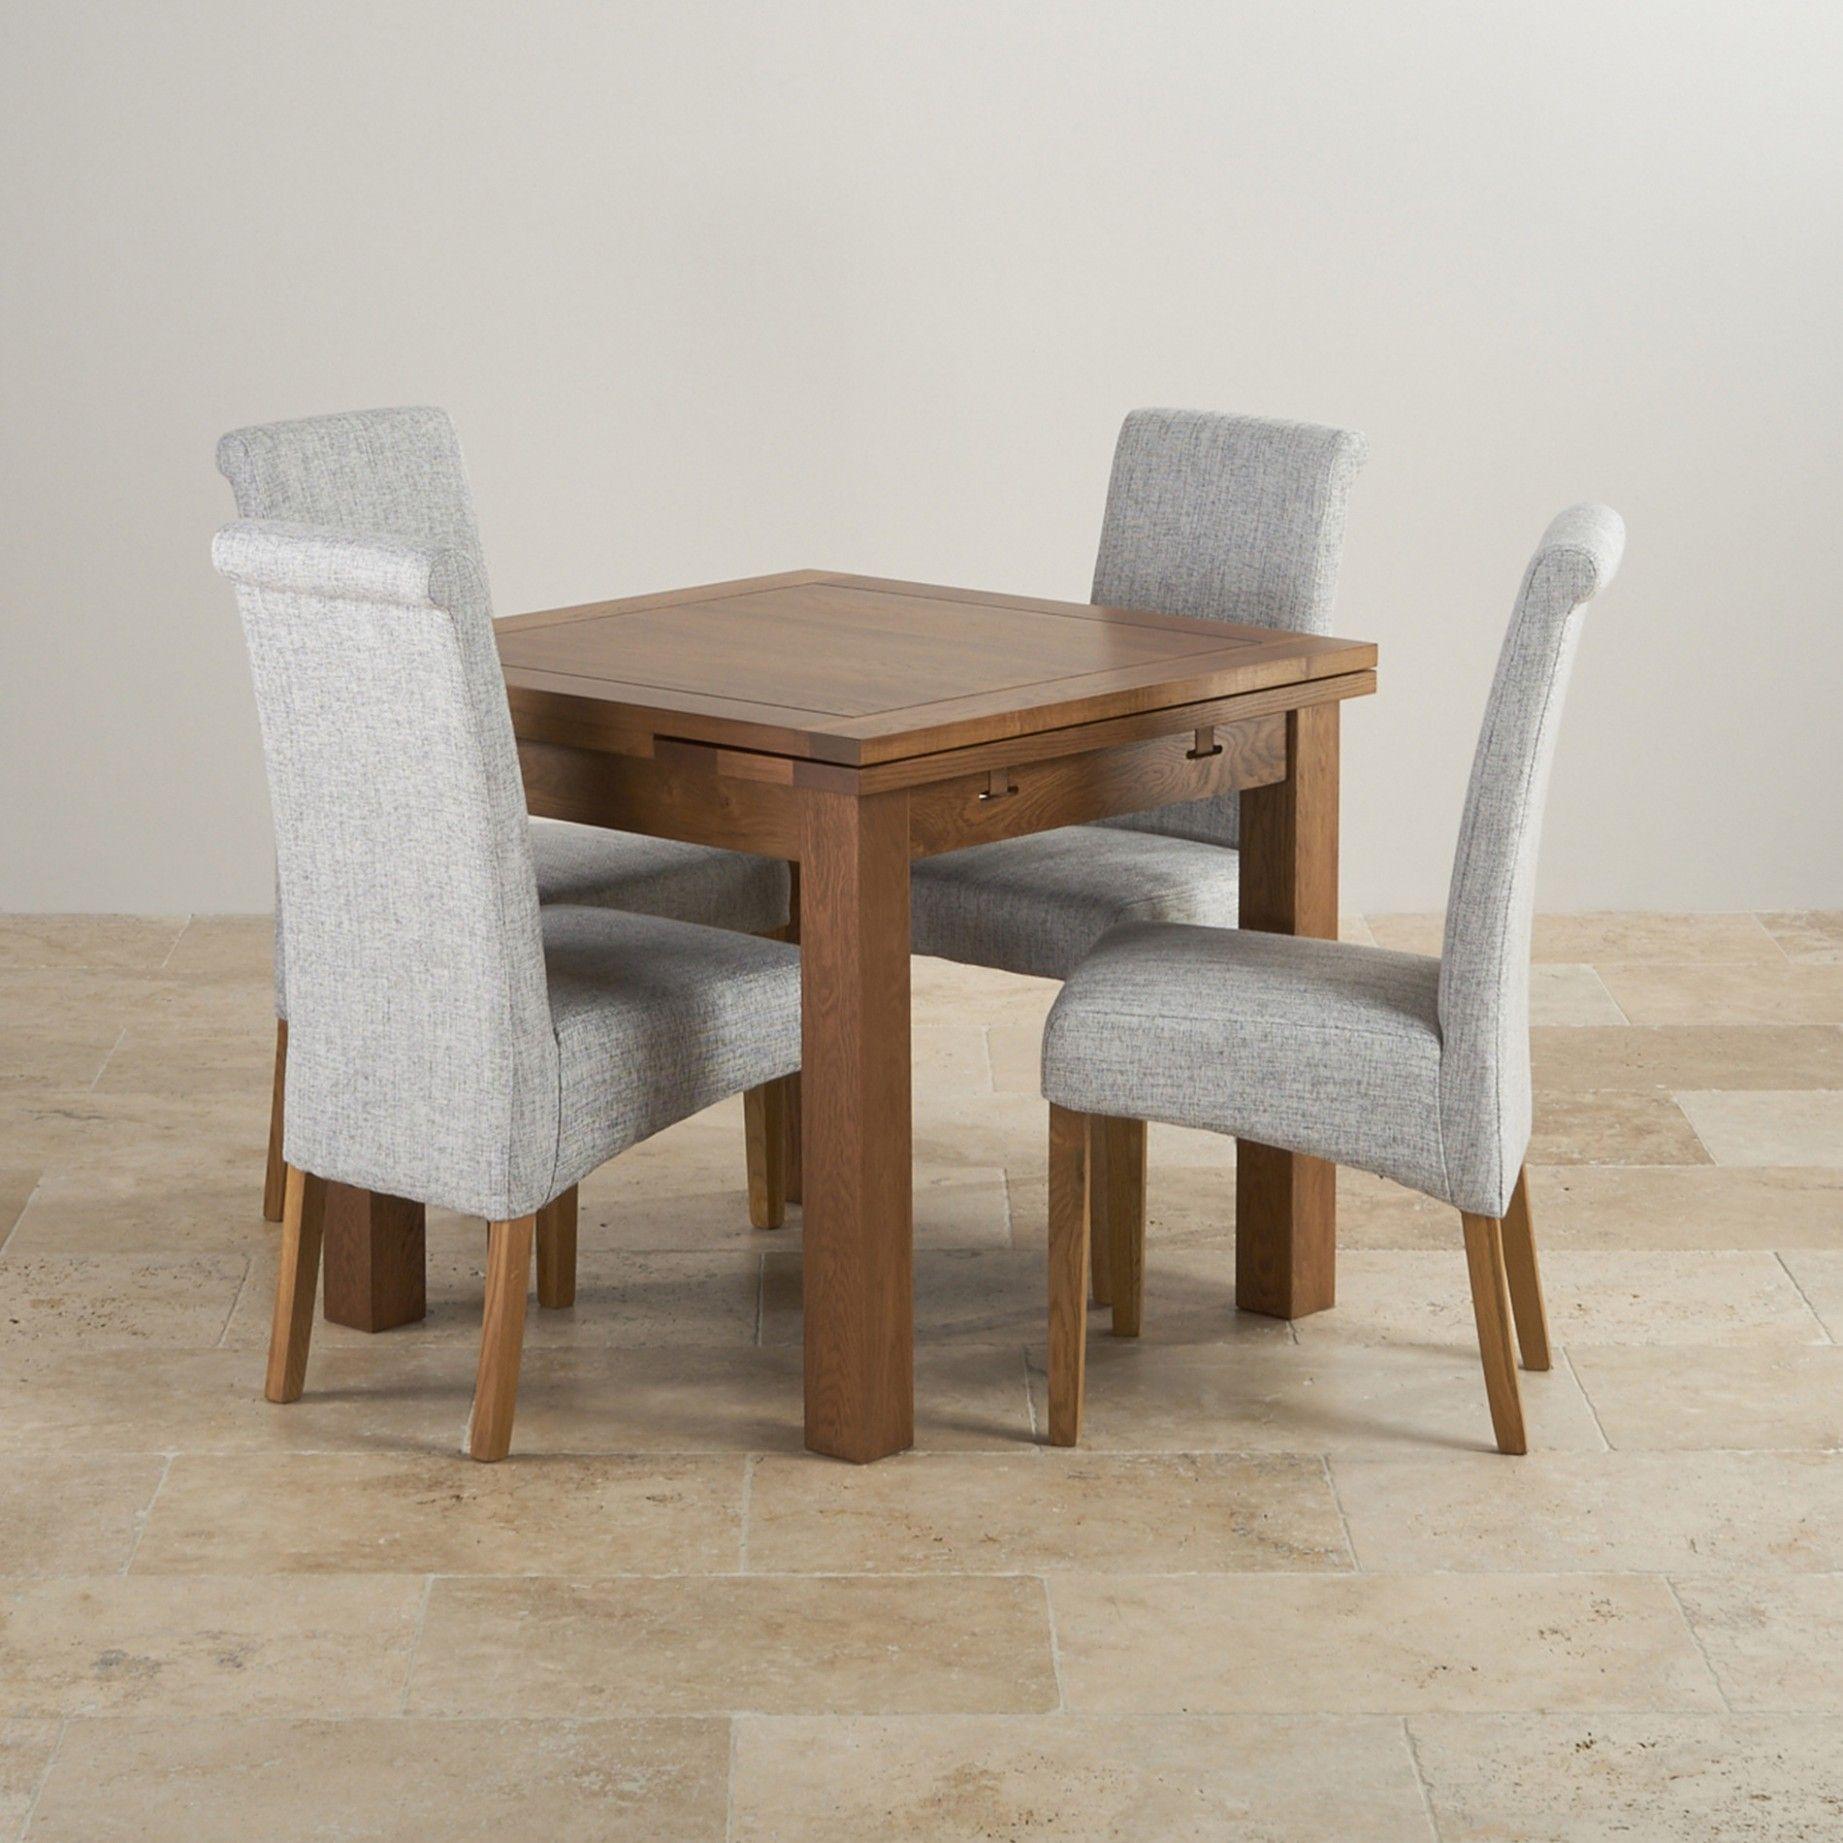 Teako Solid Oak Furniture Birmingham Di 2020